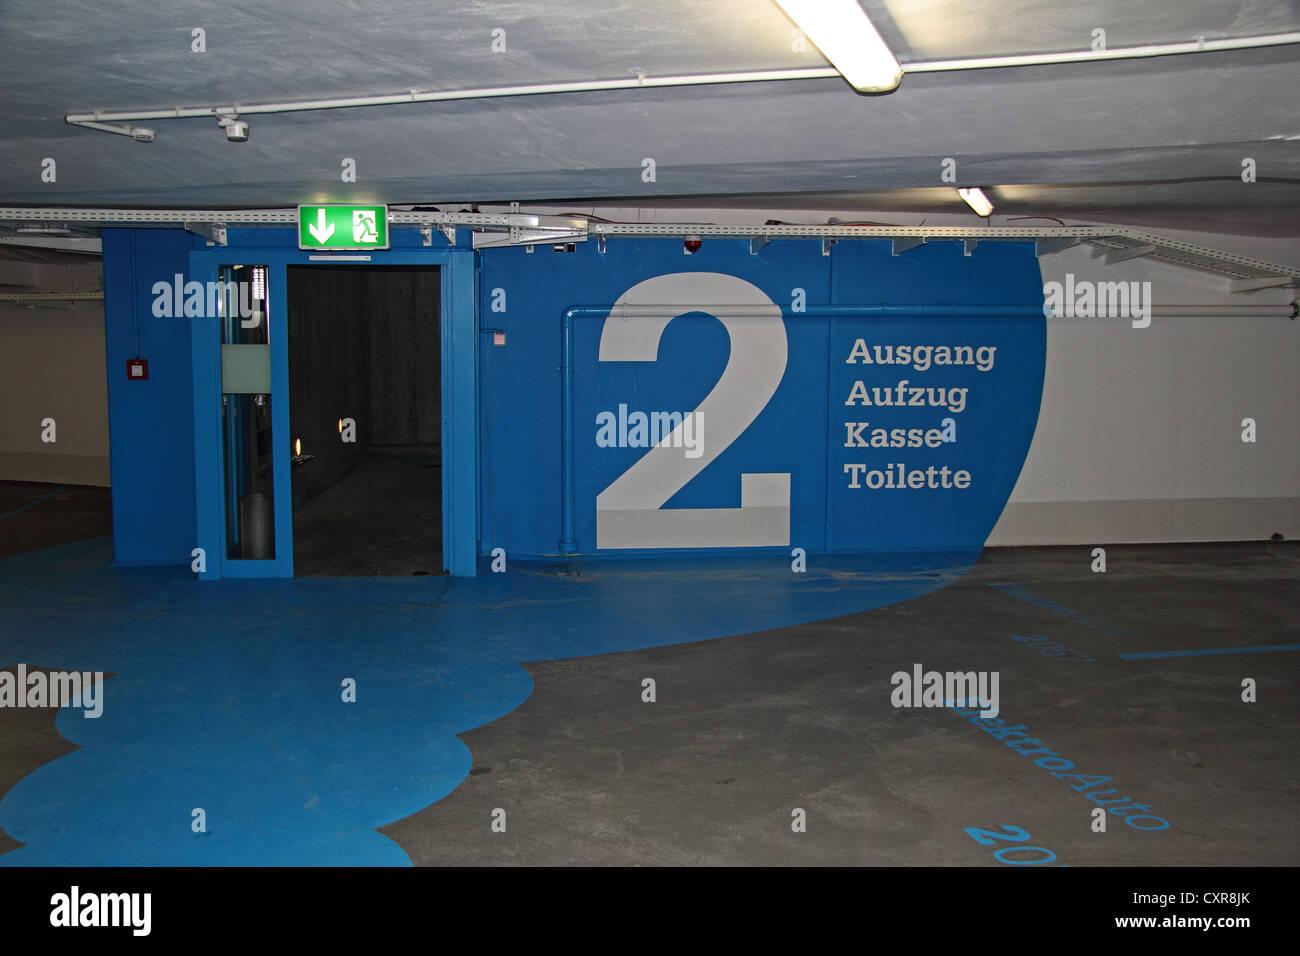 'Ausgang, Aufzug, Kasse, Toilette', German for exit, lift, pay desk, toilets', signs at Viemarktplatz - Stock Image